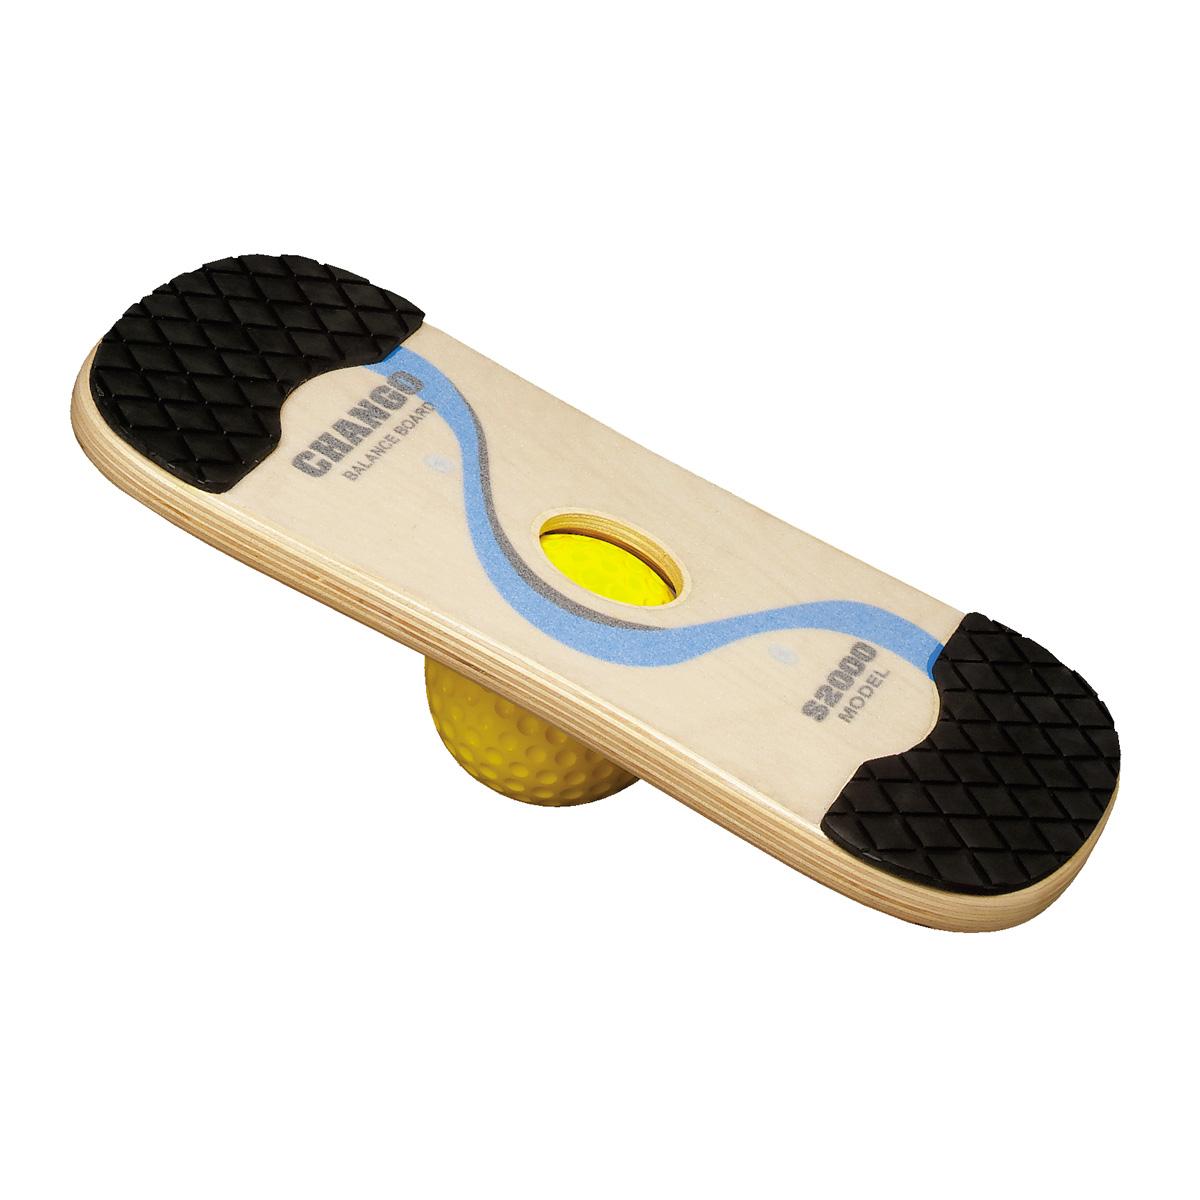 Balance Board Exercises Benefits: Combo Rocker & Wobble Board (Beginner/Advanced)